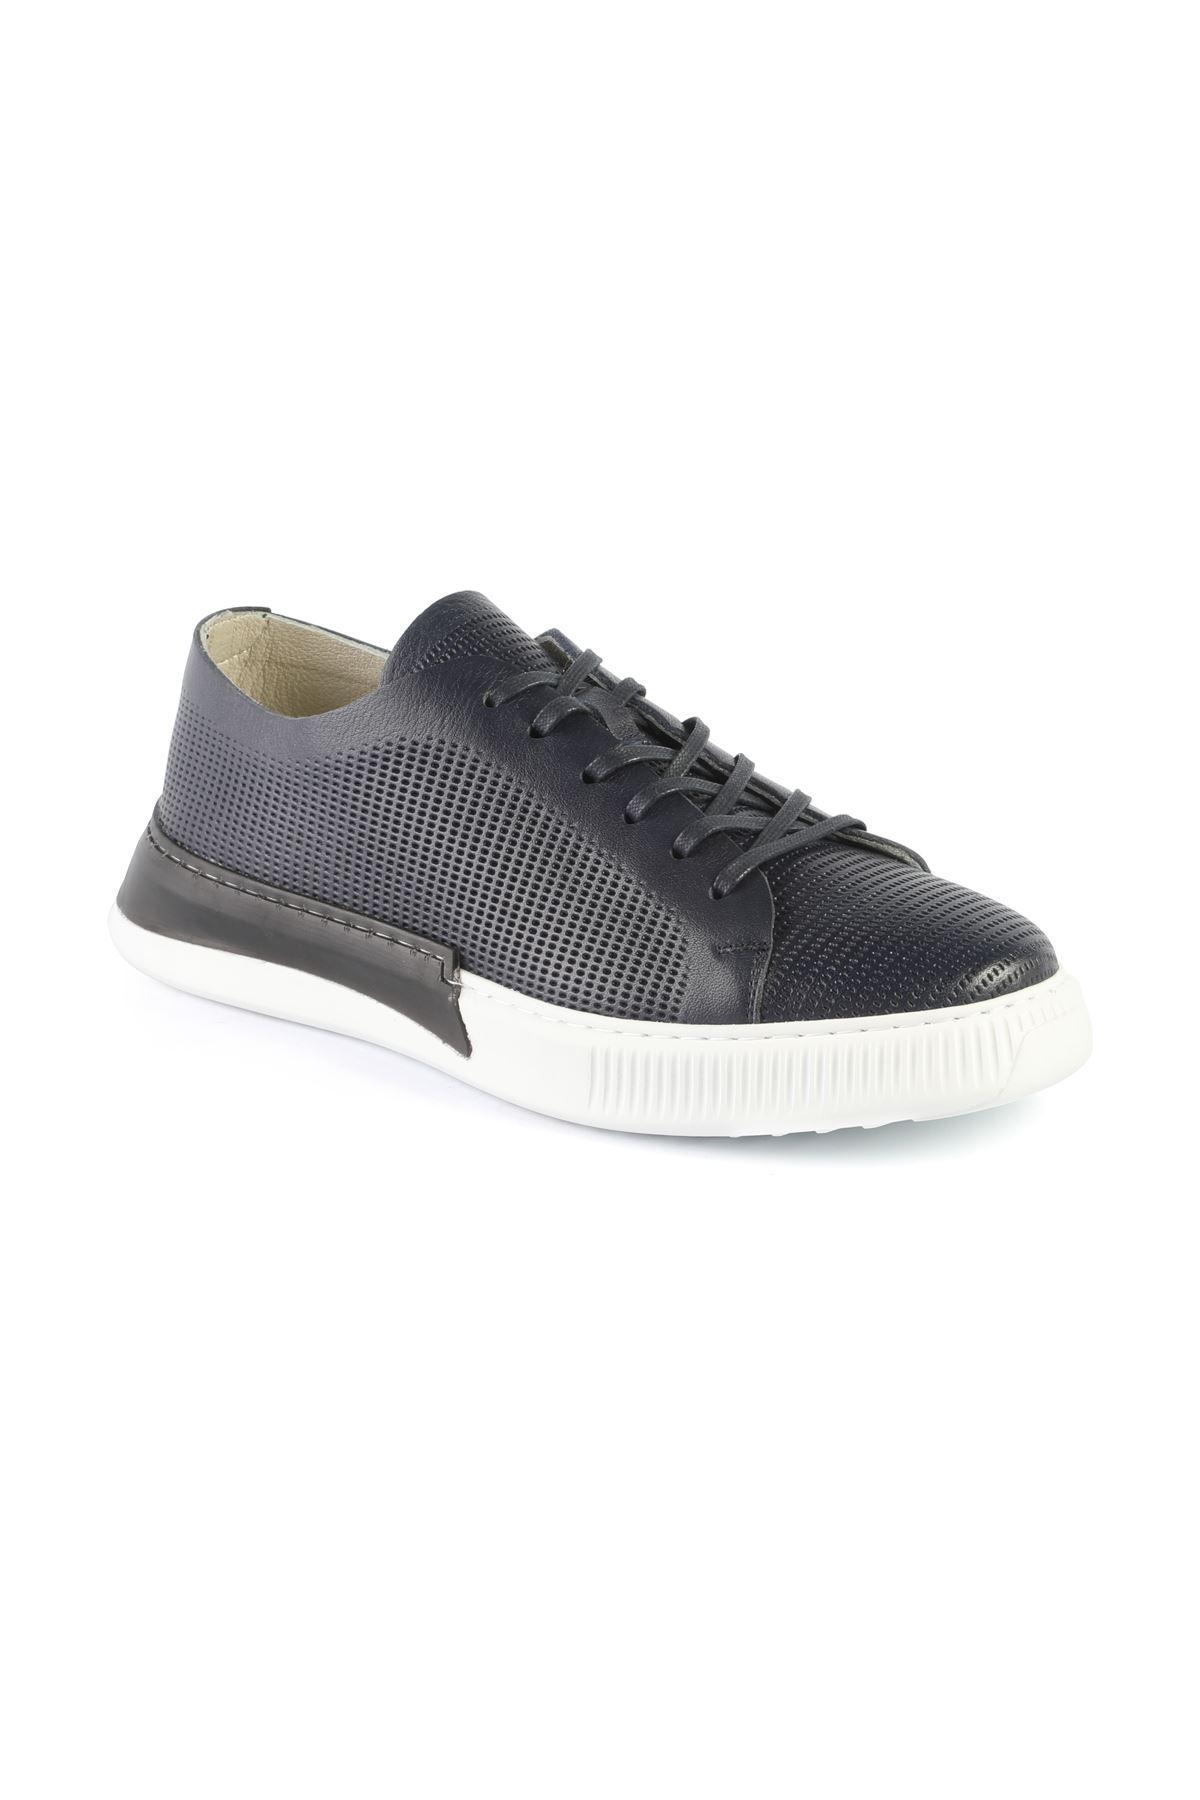 Libero L3411 Navy Blue Sneaker Shoes